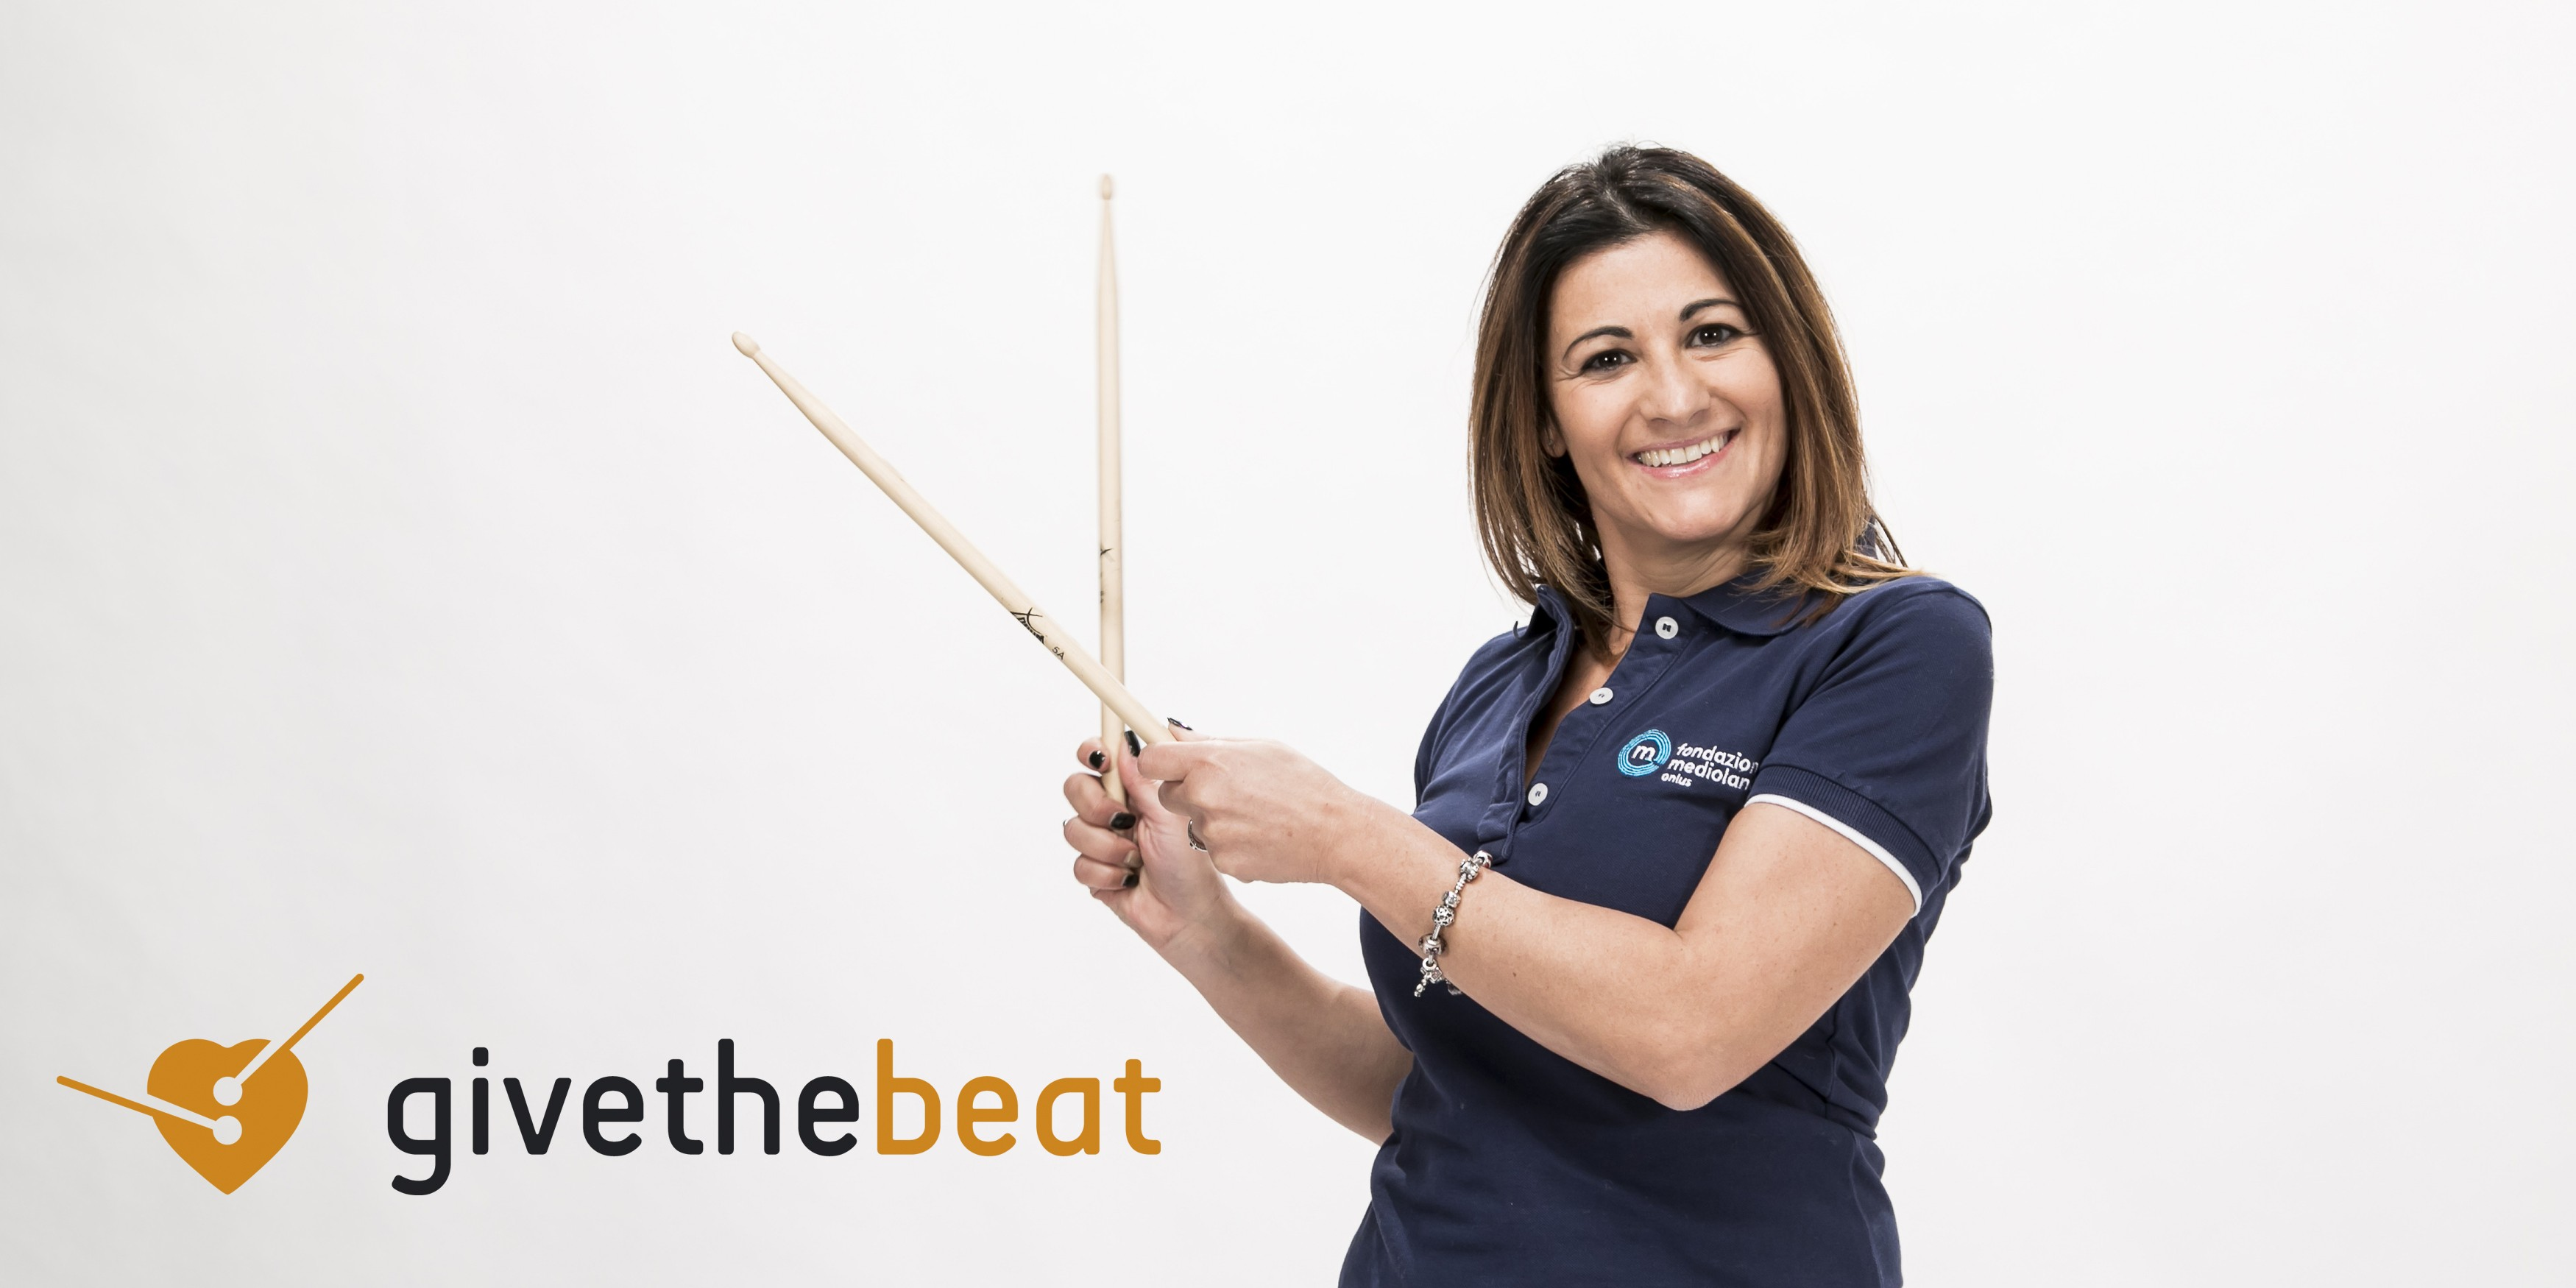 #GivetheBeat Team Prince-Susan Retuerto